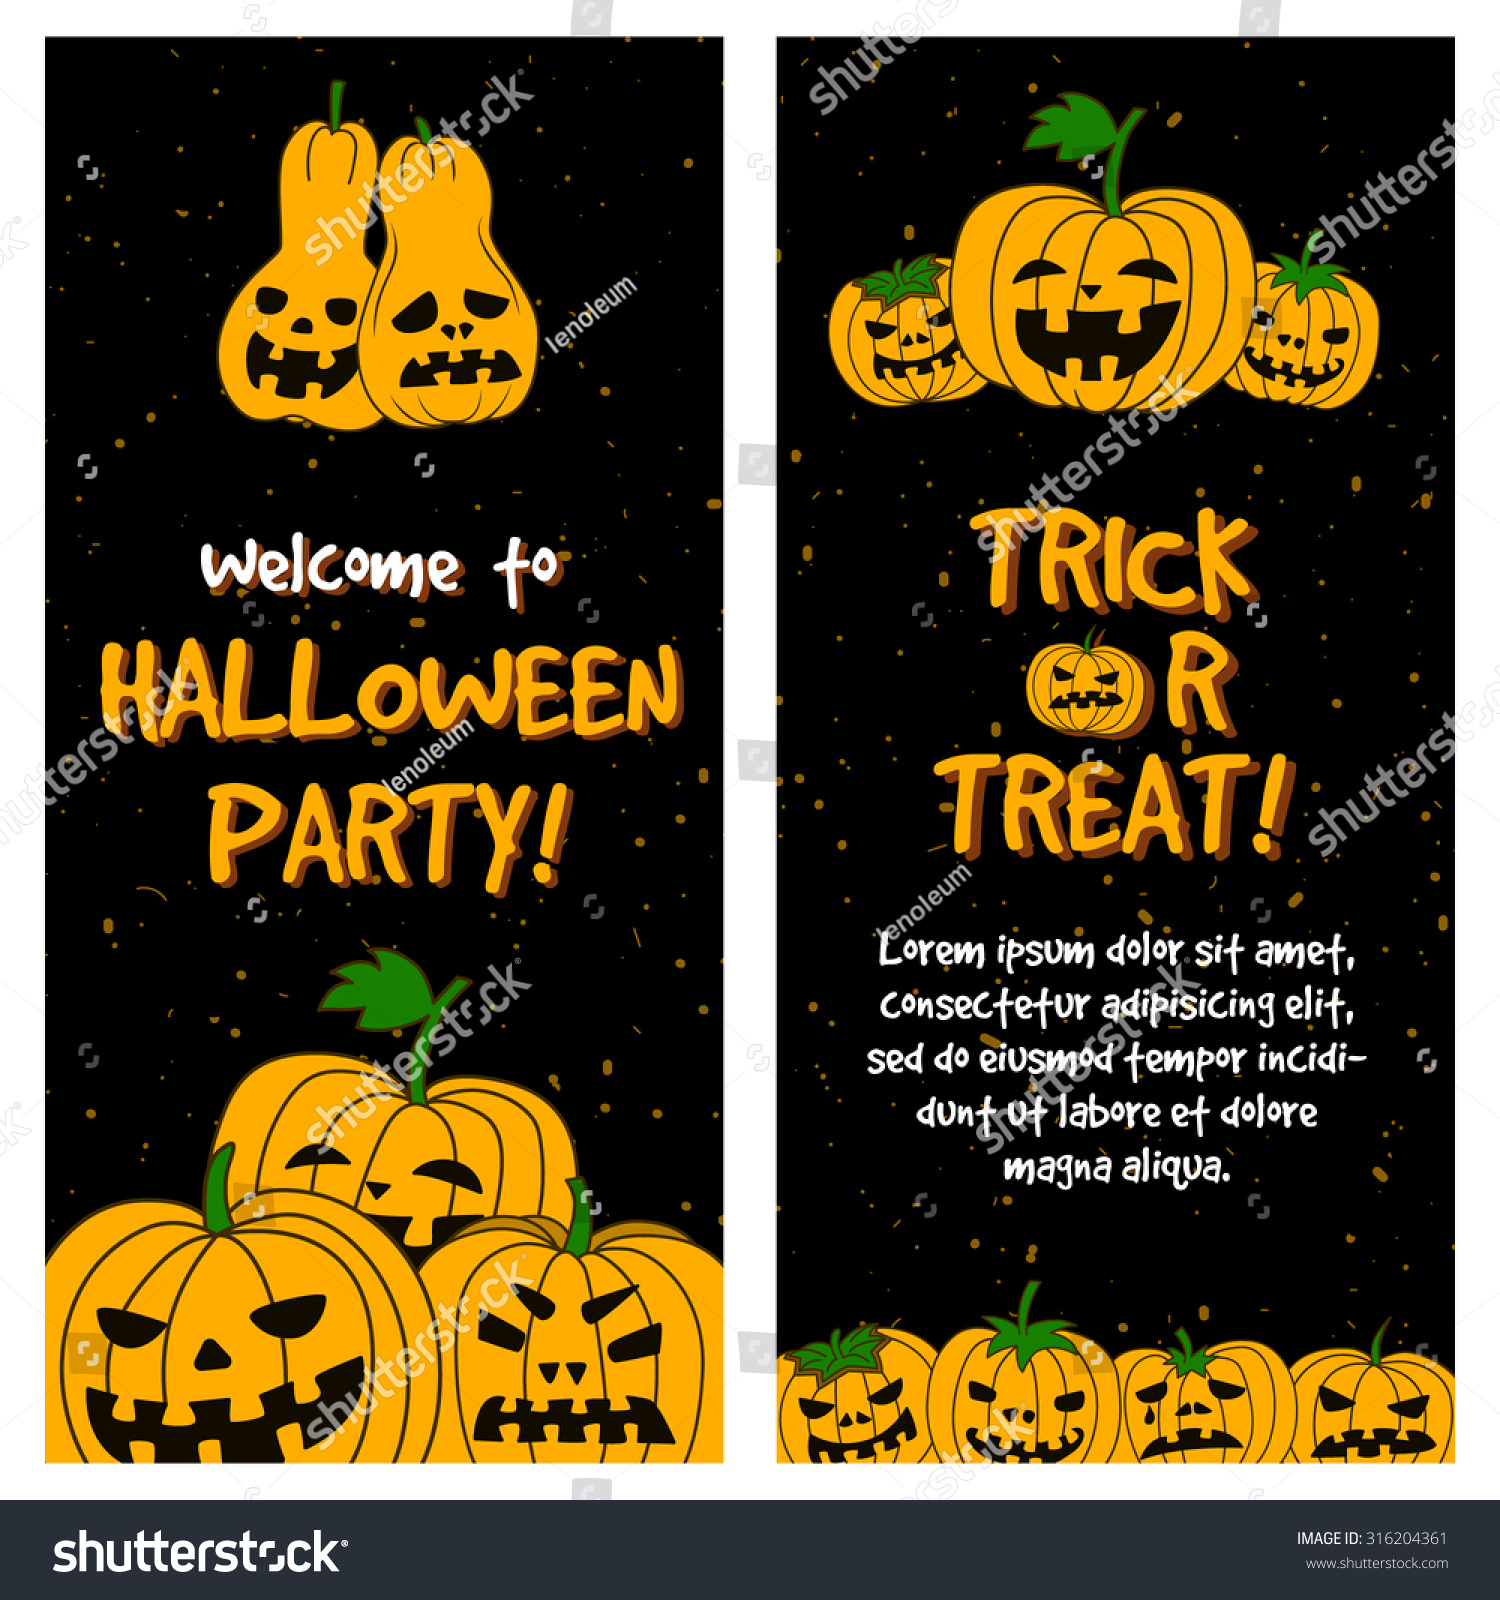 Halloween Party Vertical Template Banner Poster Stock Vector ...